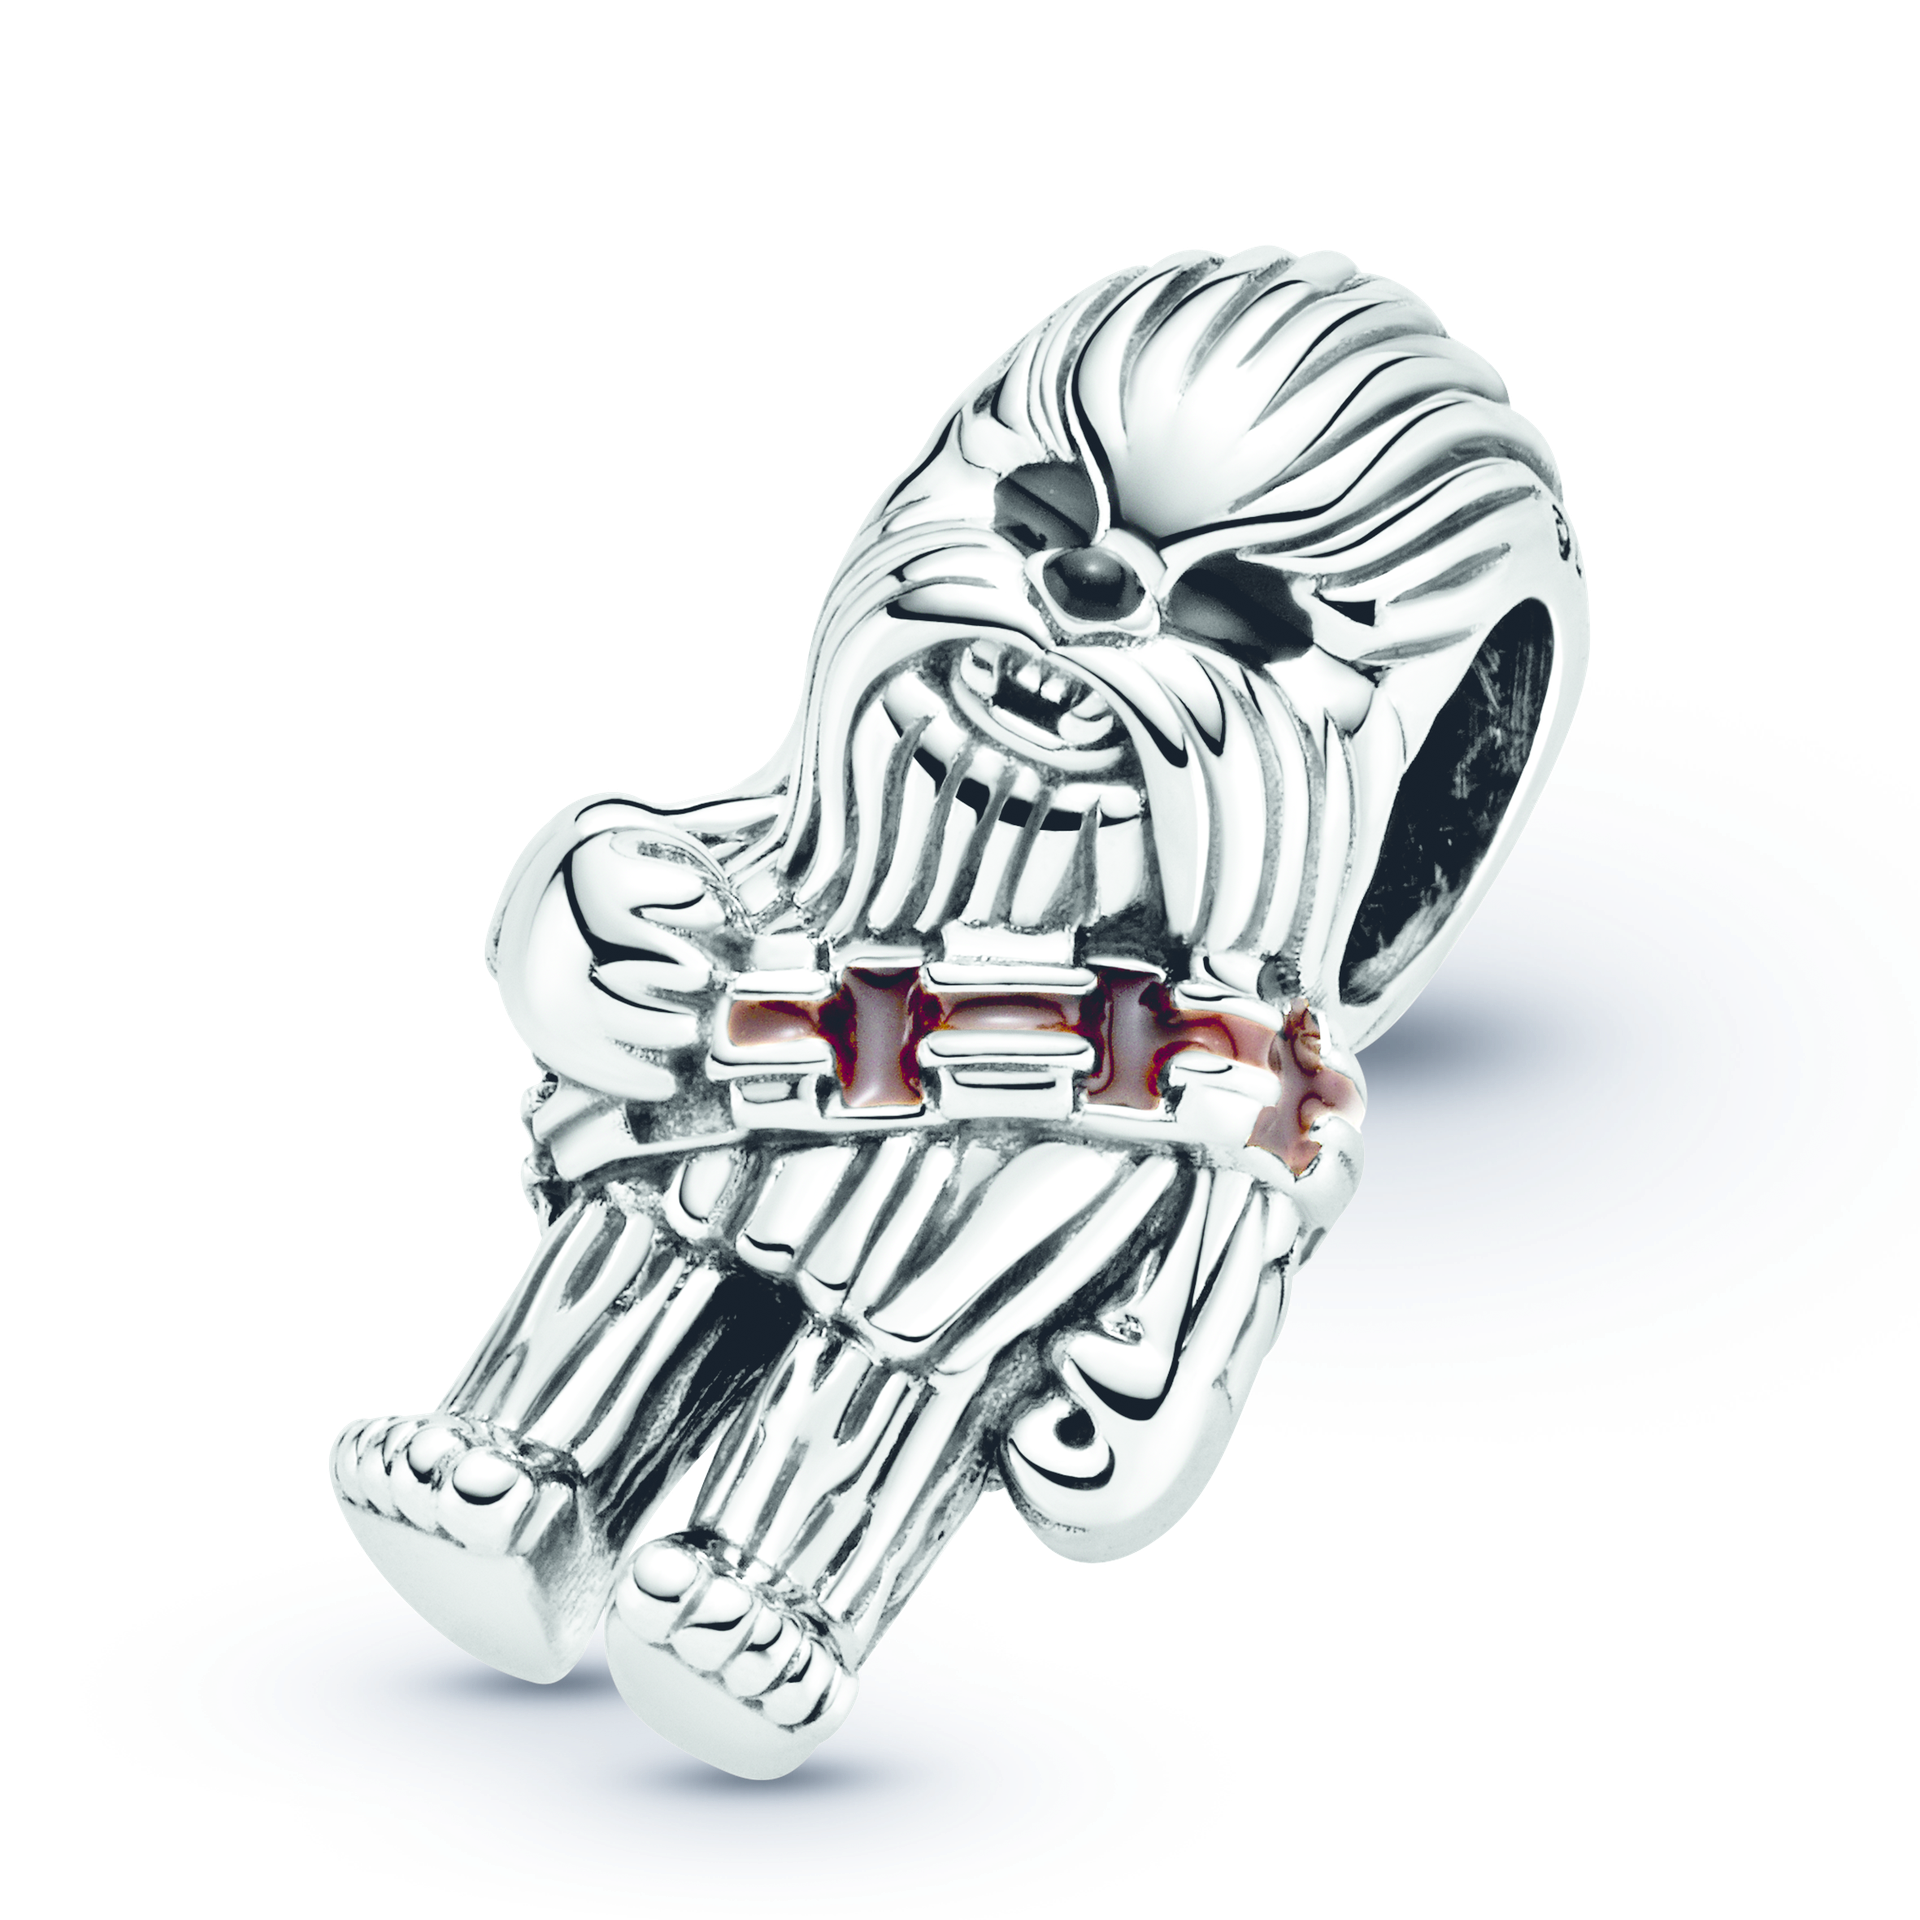 Star Wars(TM) × Pandoraジュエリーコレクション